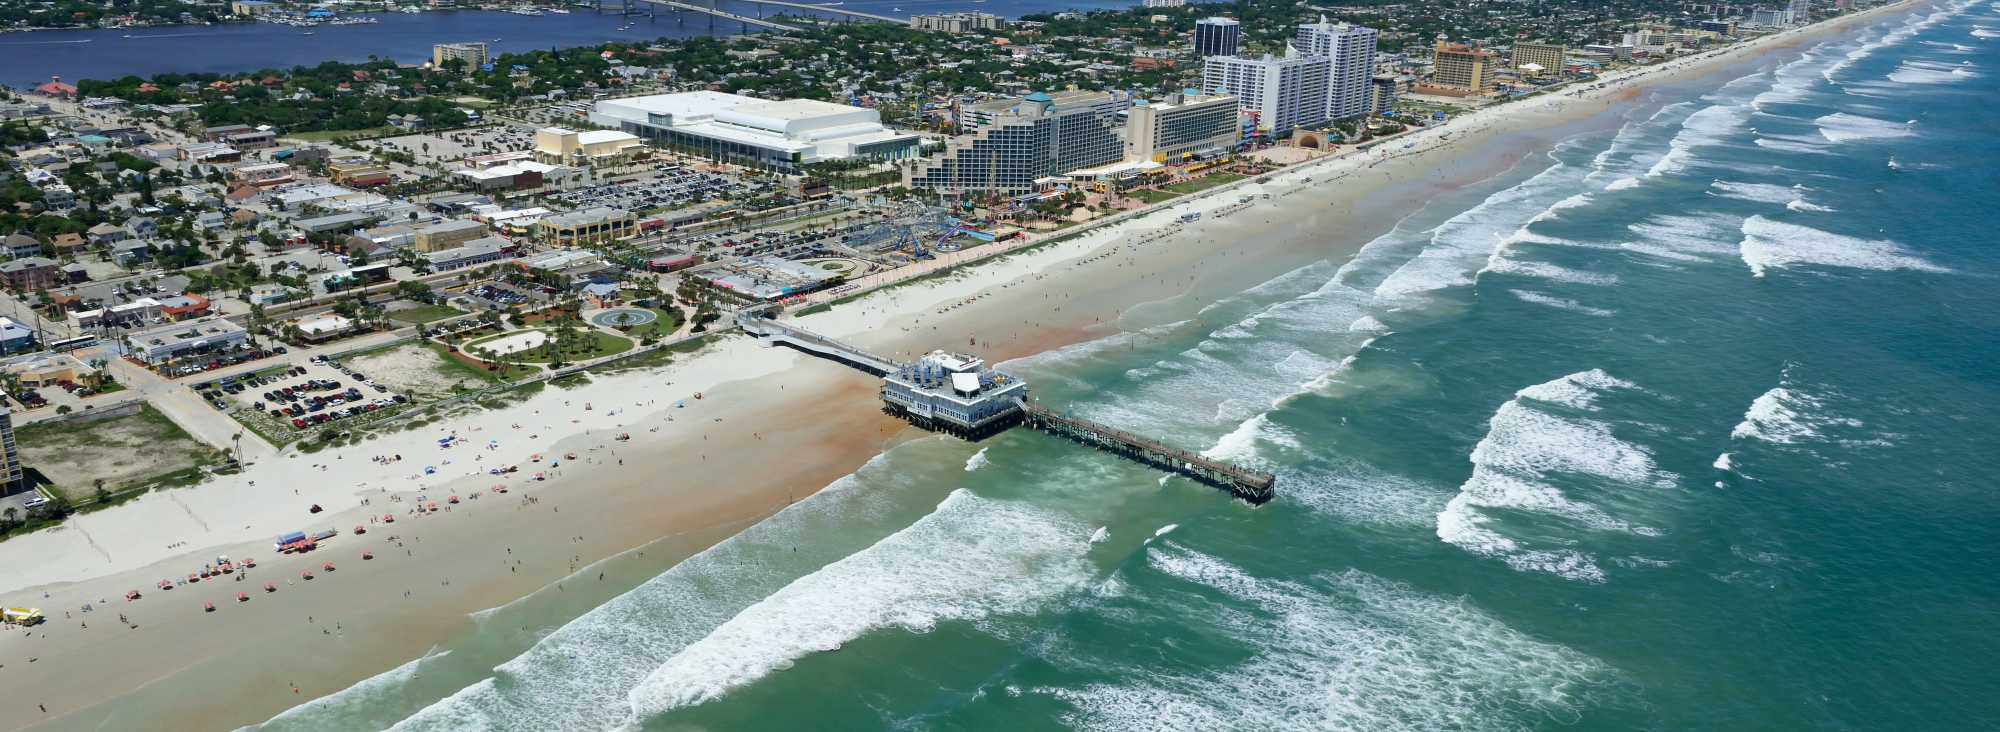 Daytona Beach core district